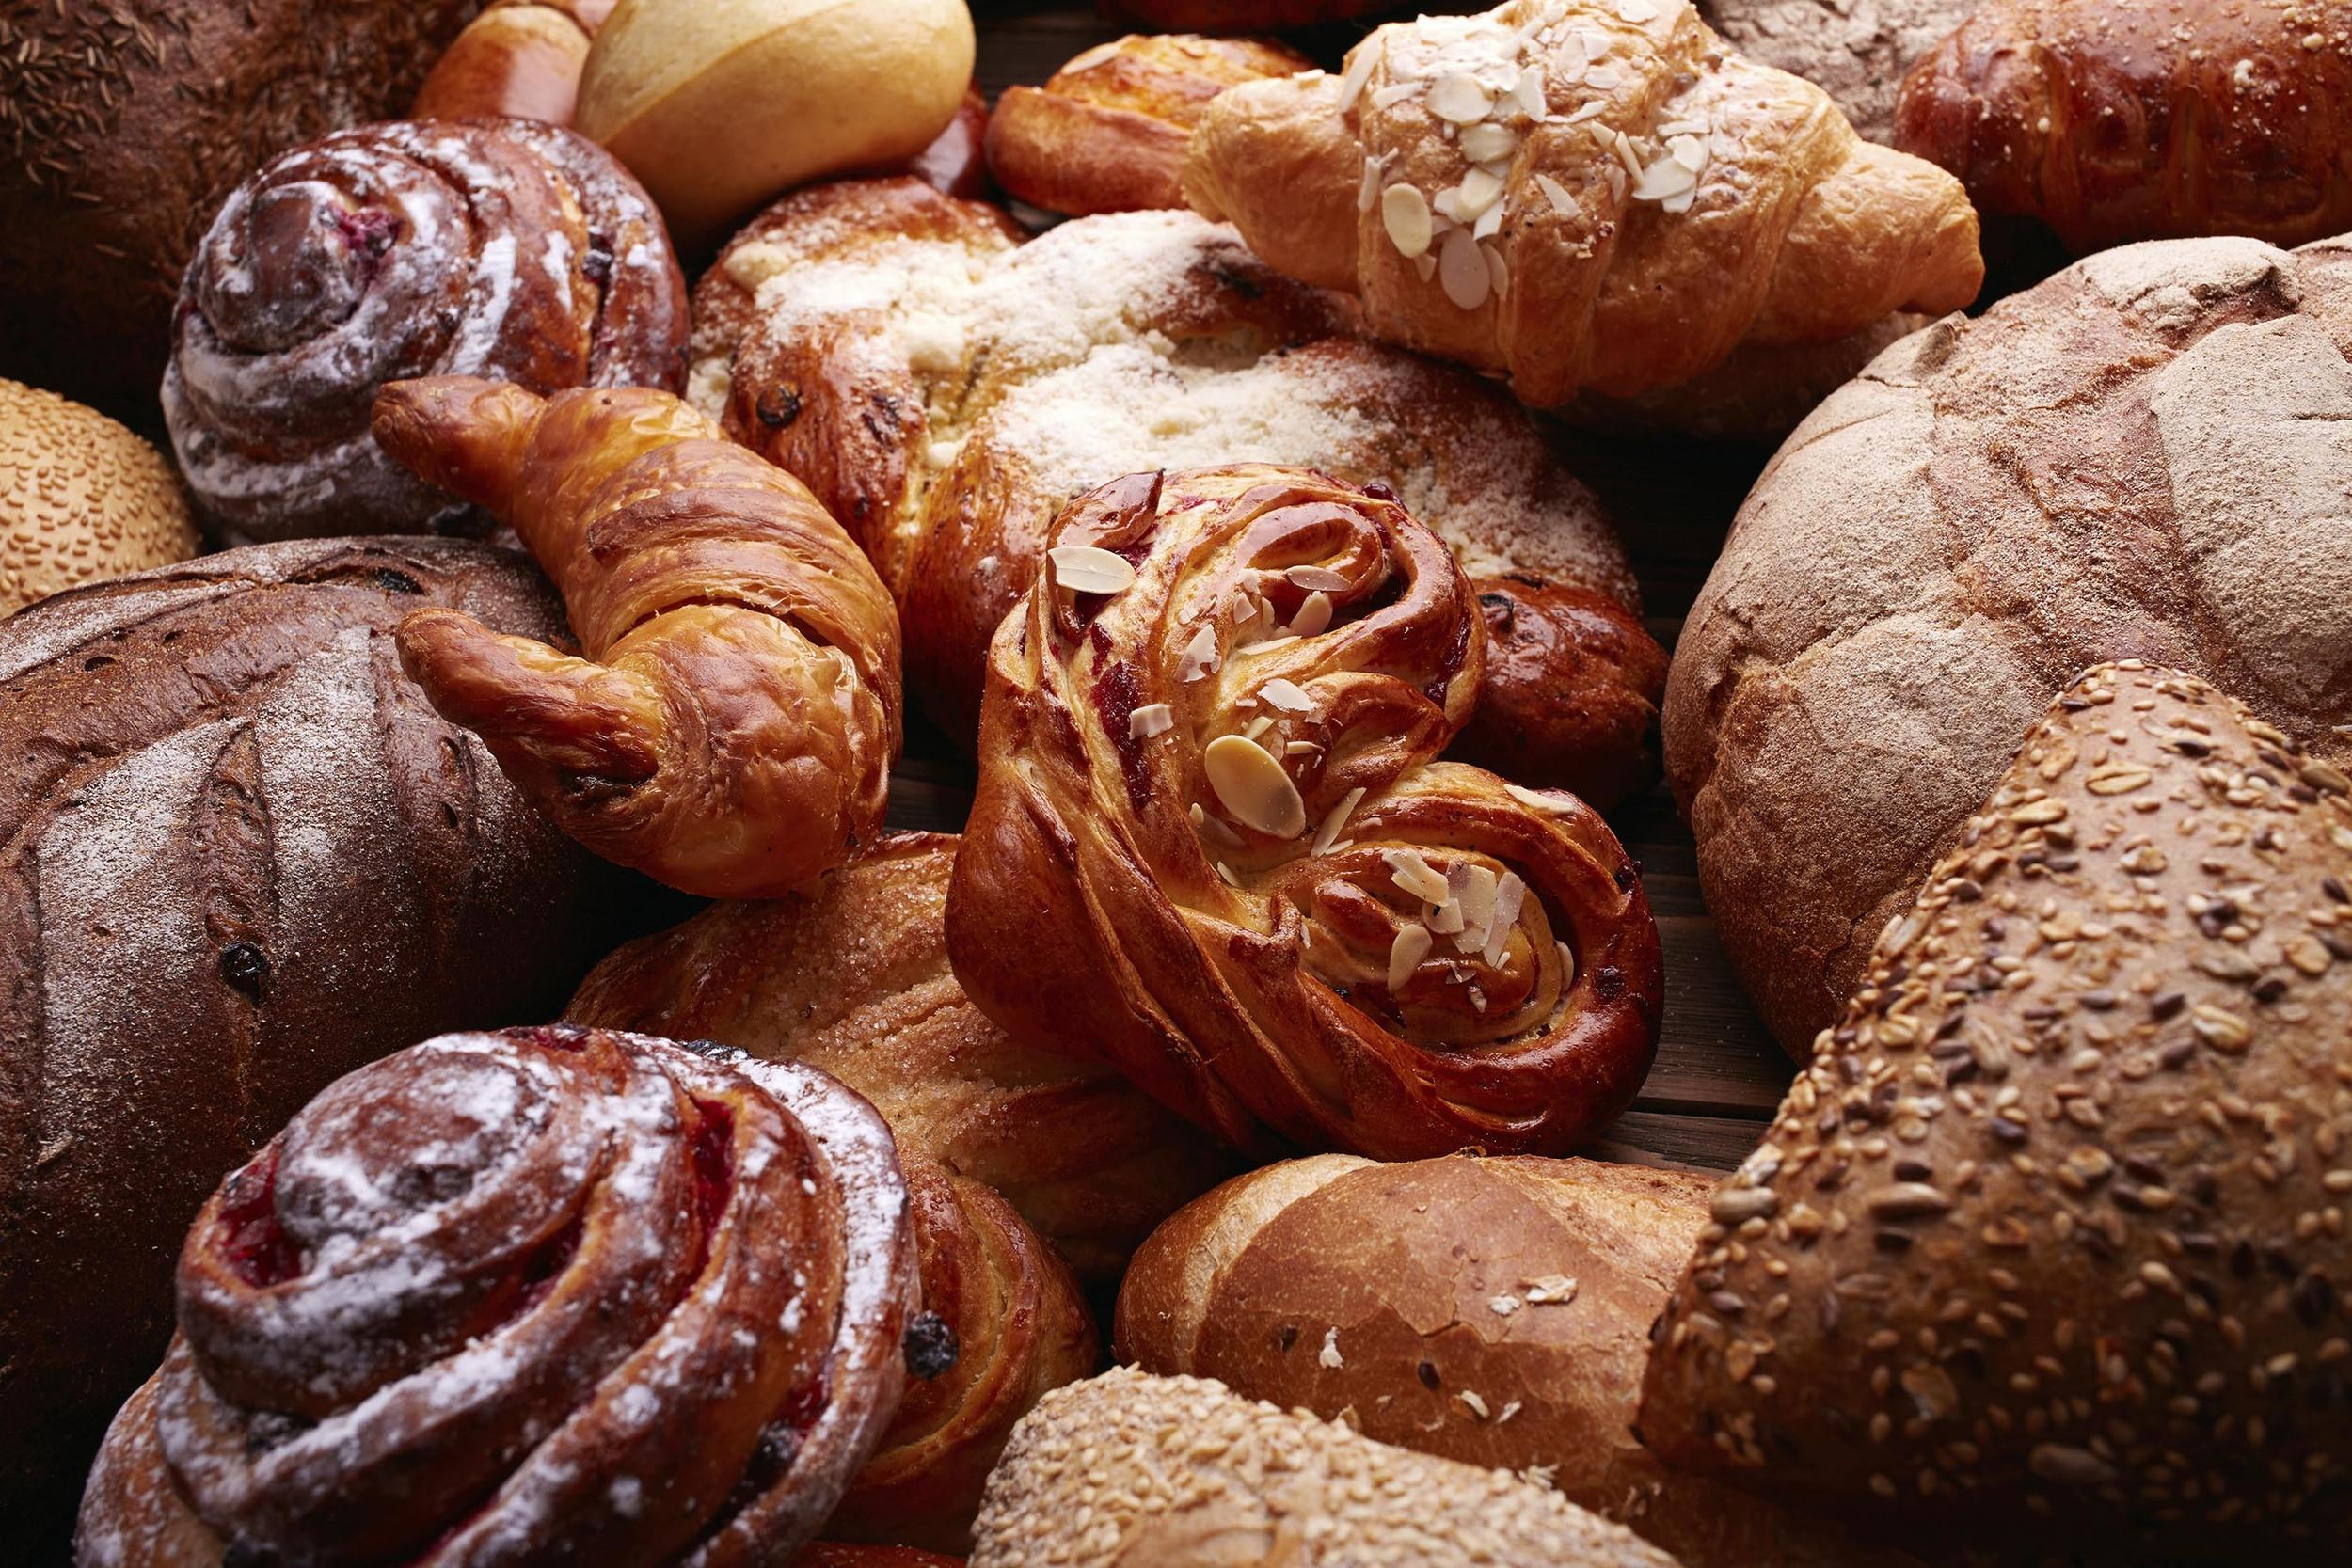 bakeryproducts.jpg